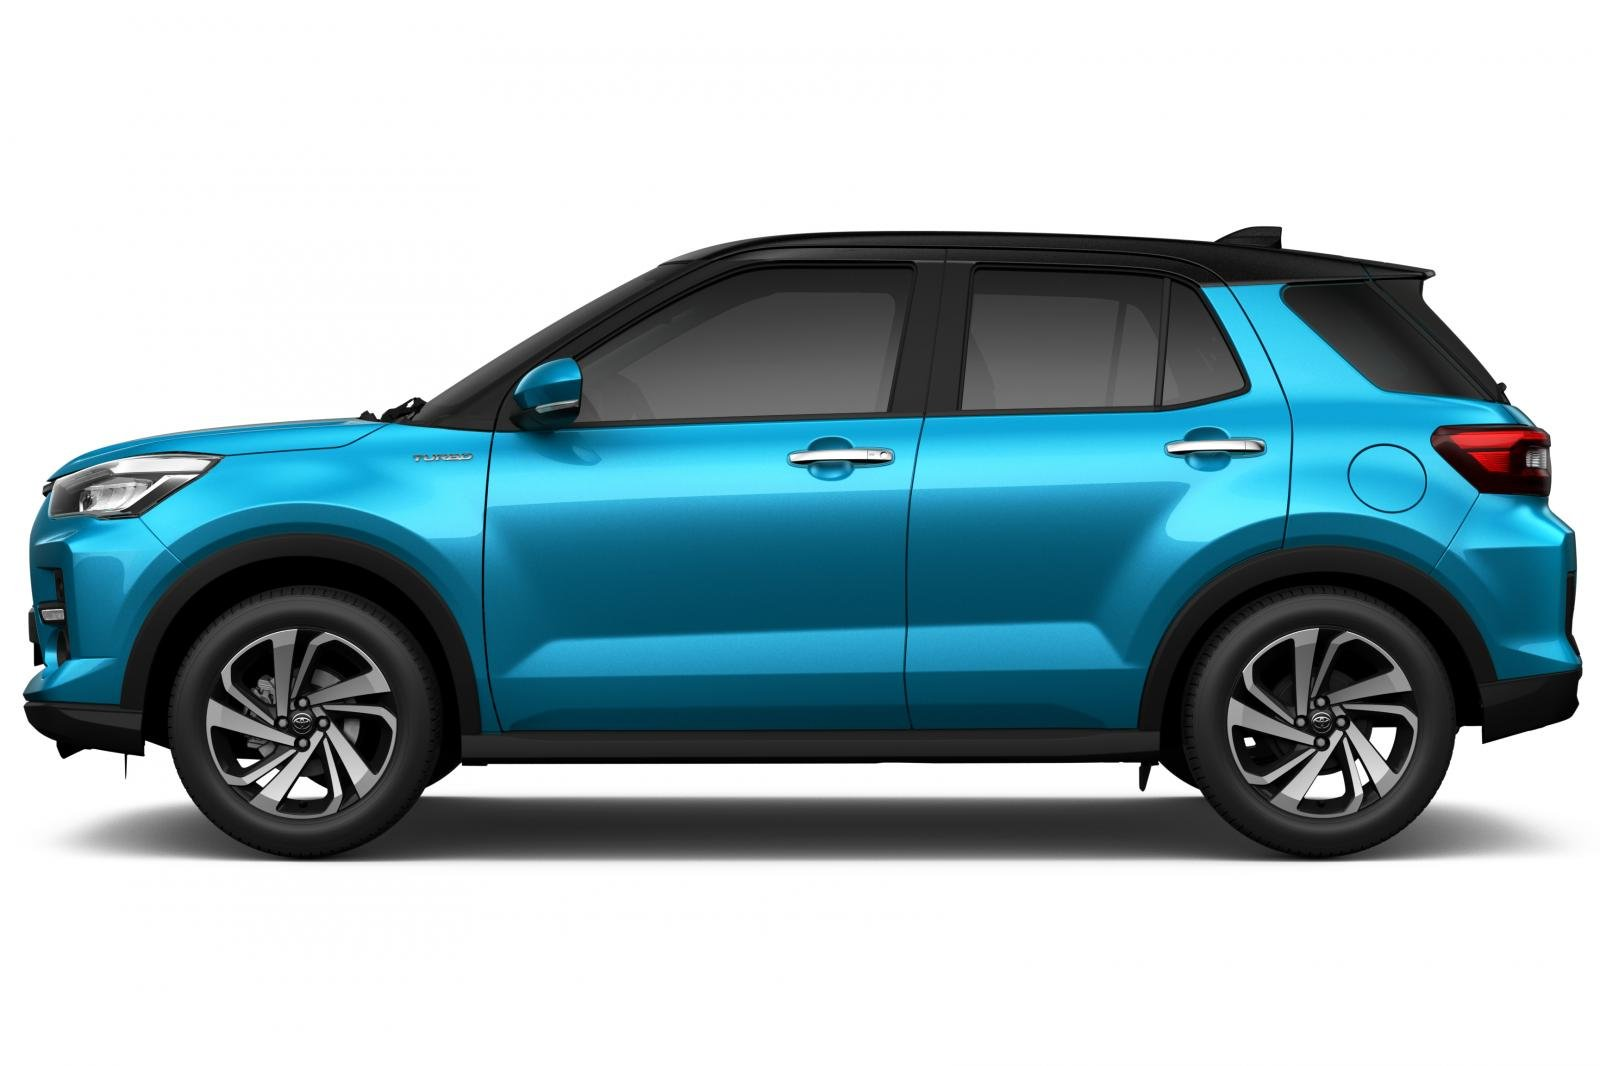 Ngoại thất Toyota Raize.